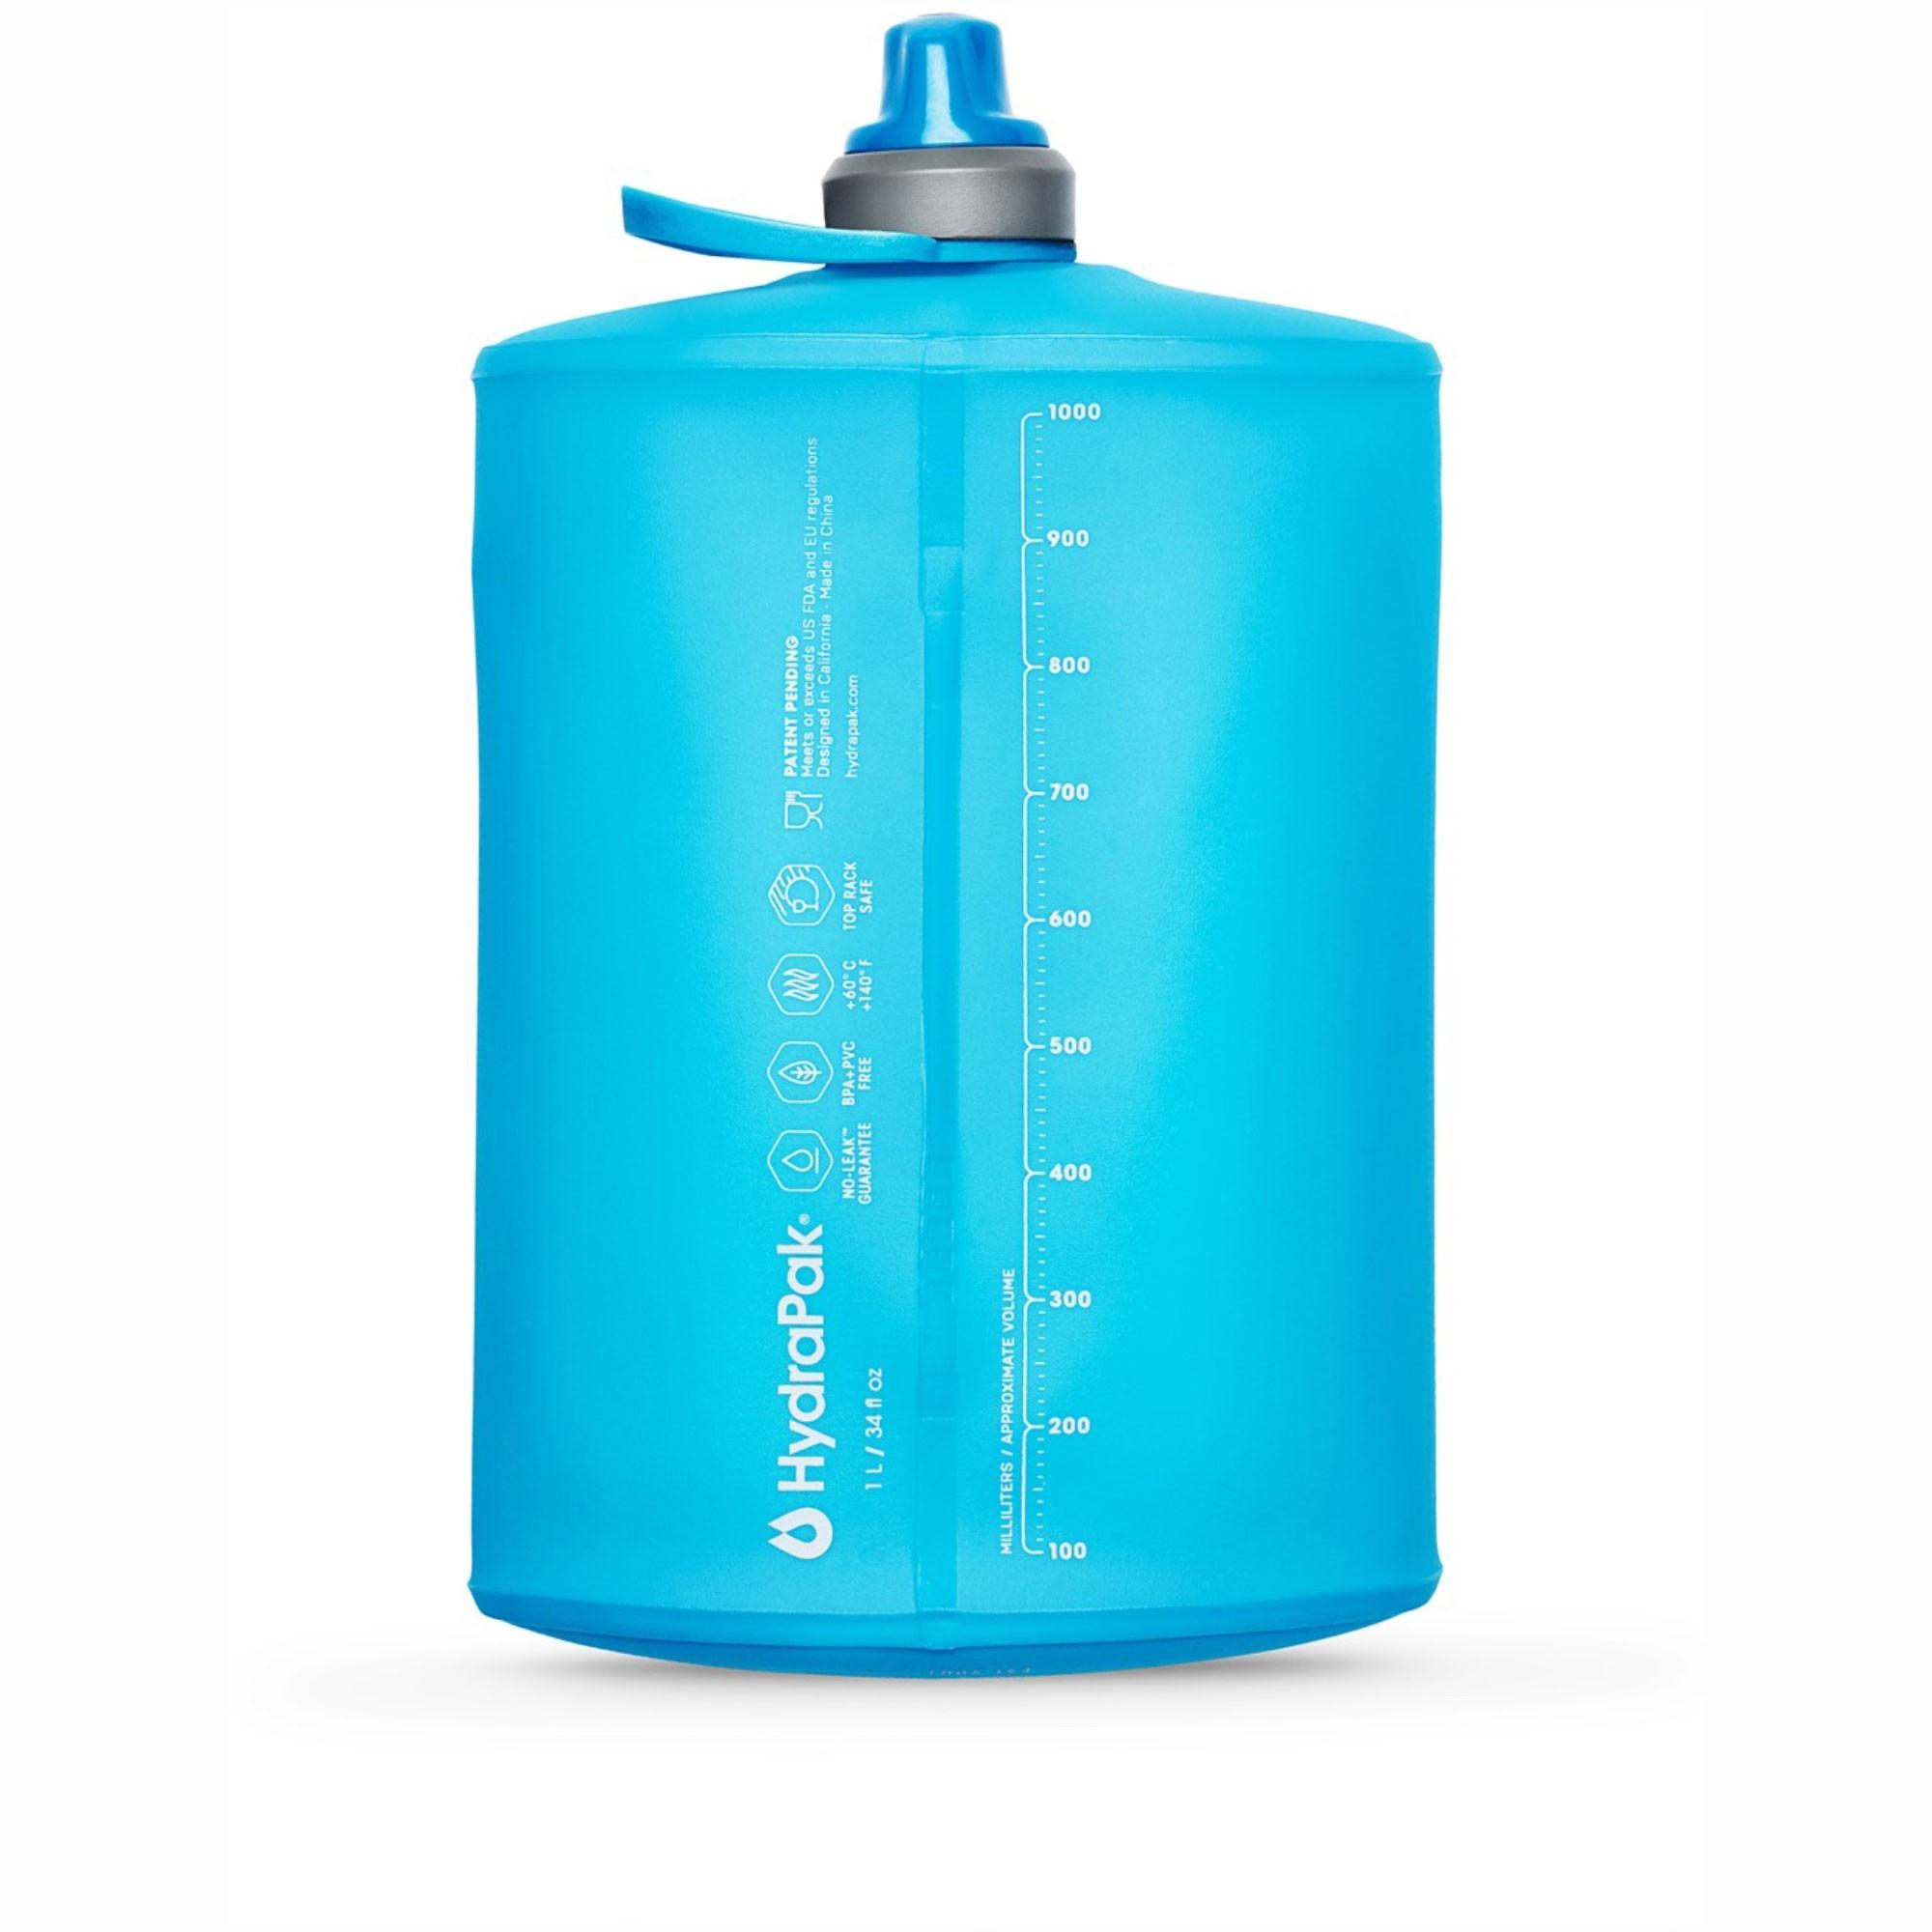 Hydrapak Stow 1L Collapsible Bottle - Malibu Blue